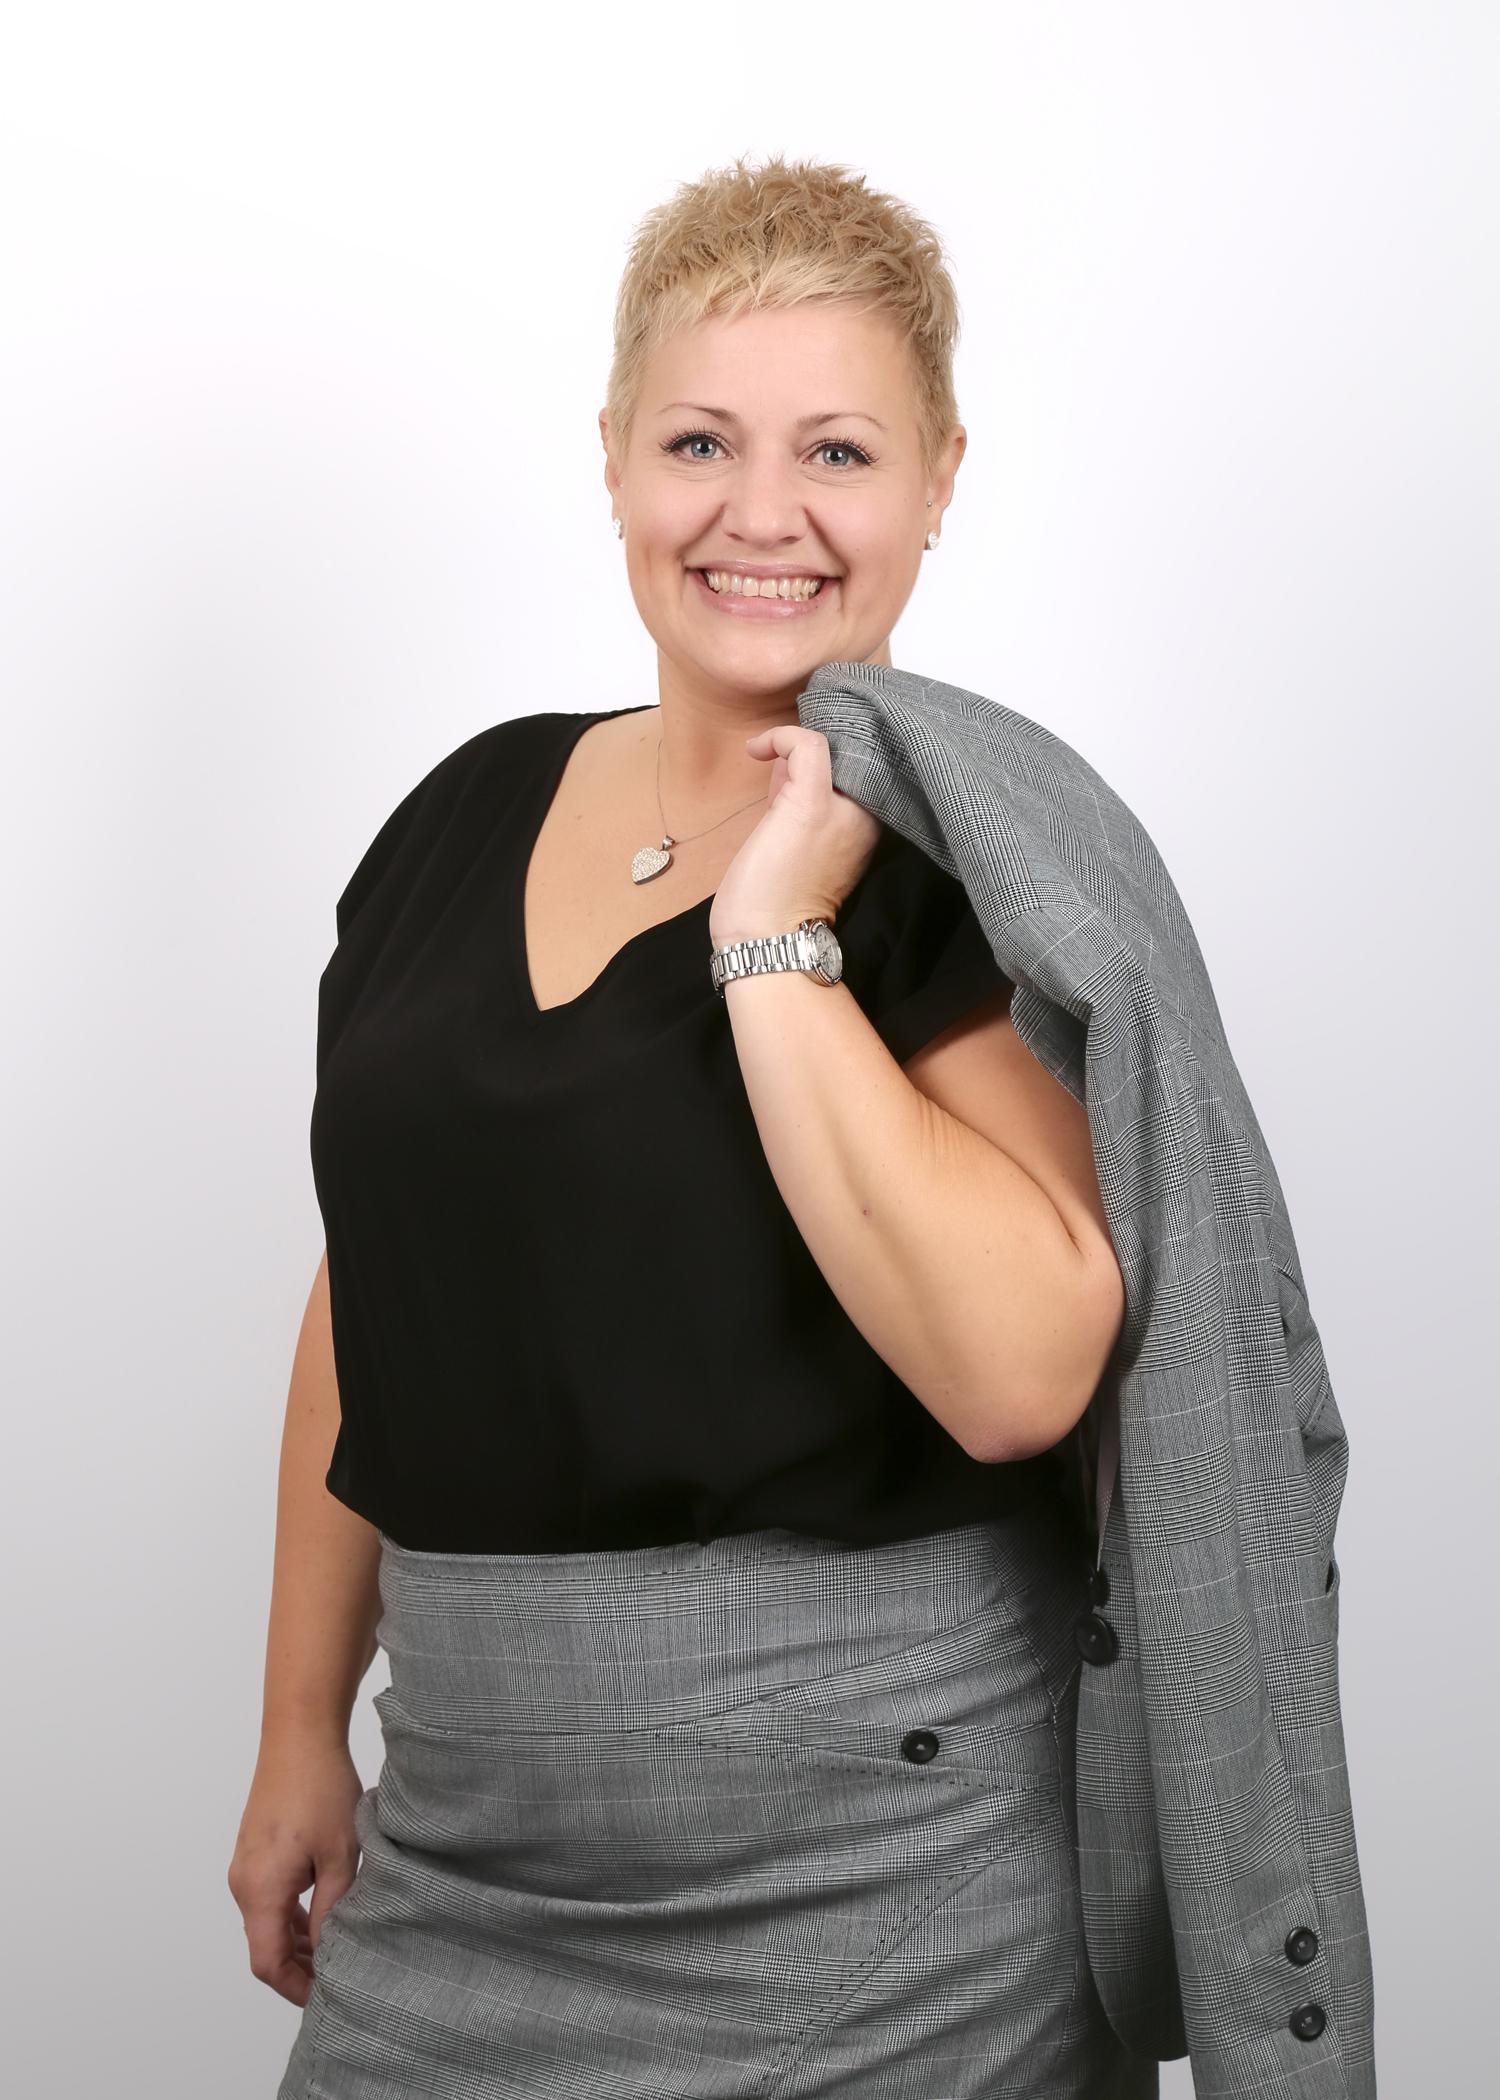 zigzag-photography-leicester-corporate-staff-photos-head-shots-headshot-business-profile-studio-professional-4.jpg